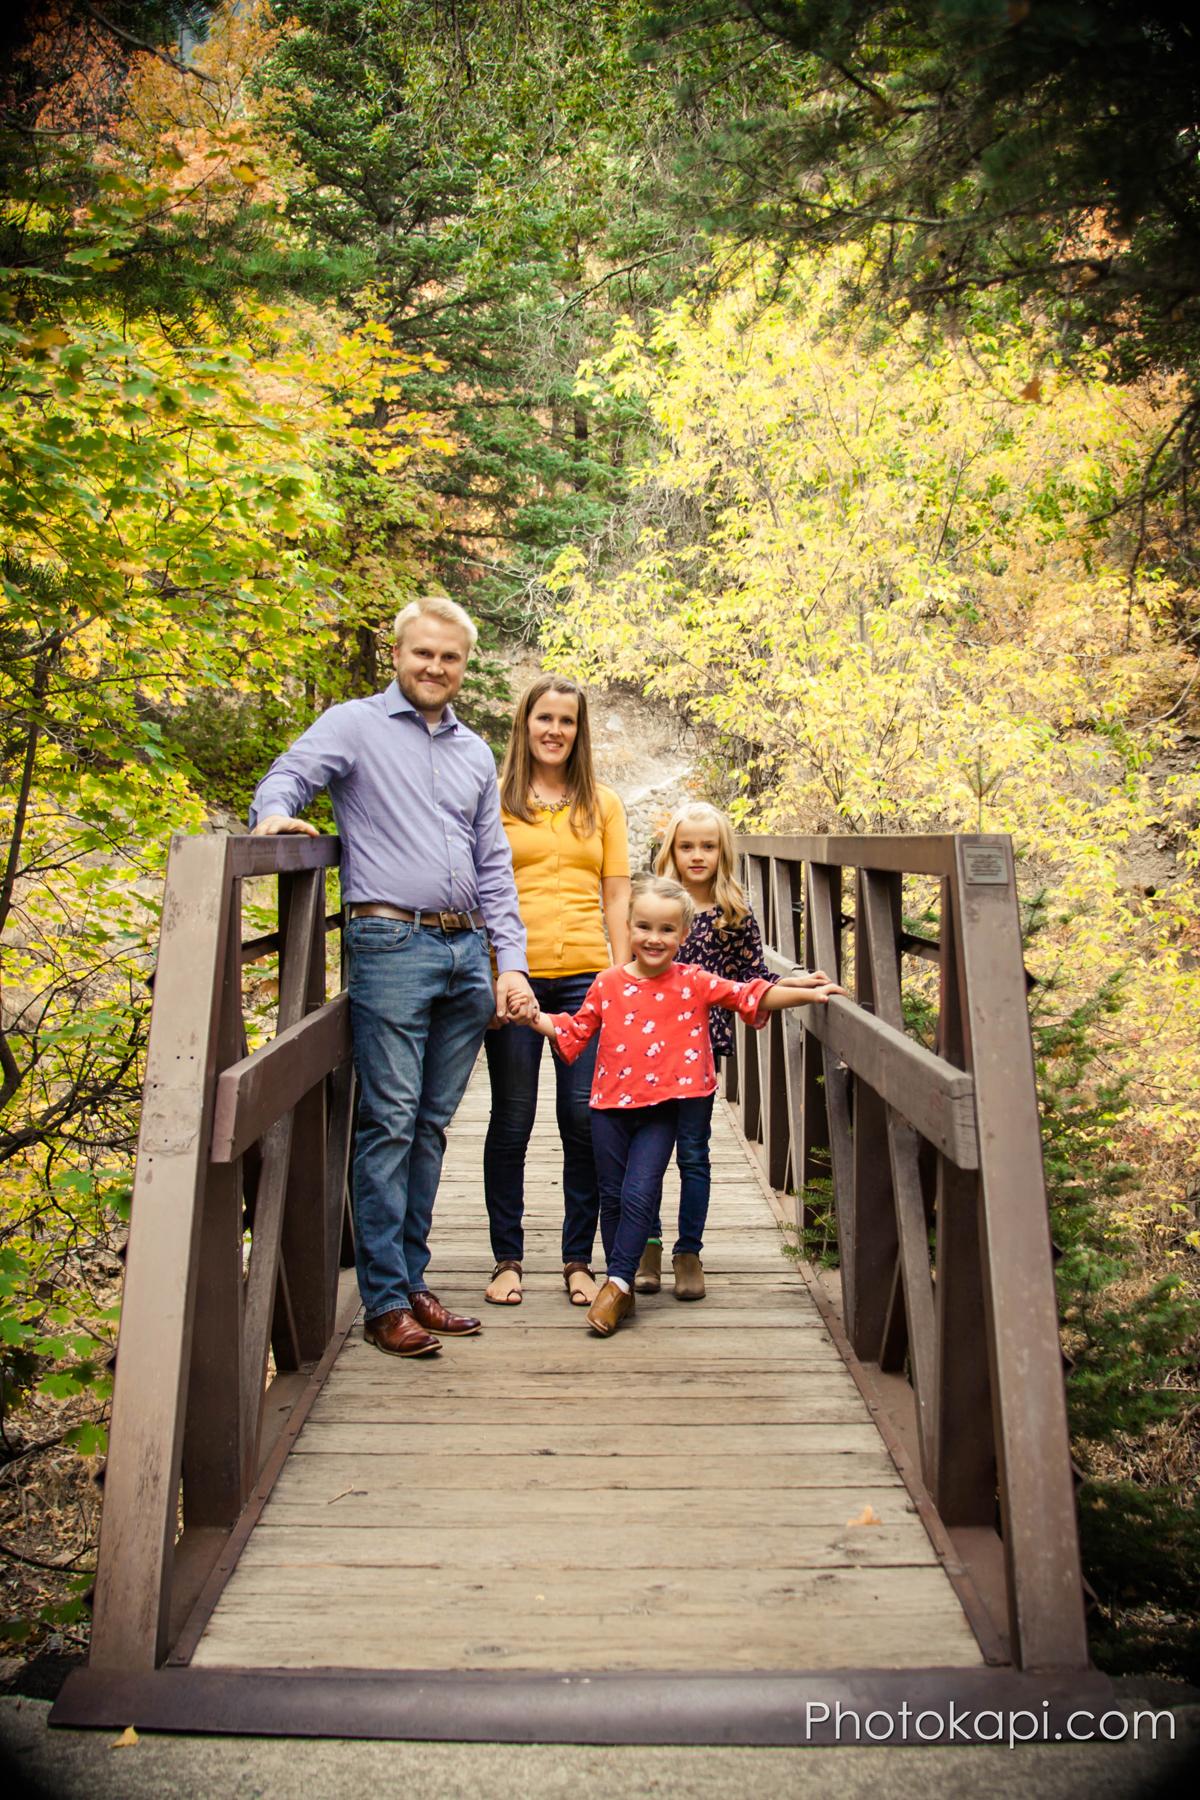 Happy Family Fall Photos | Photokapi.com